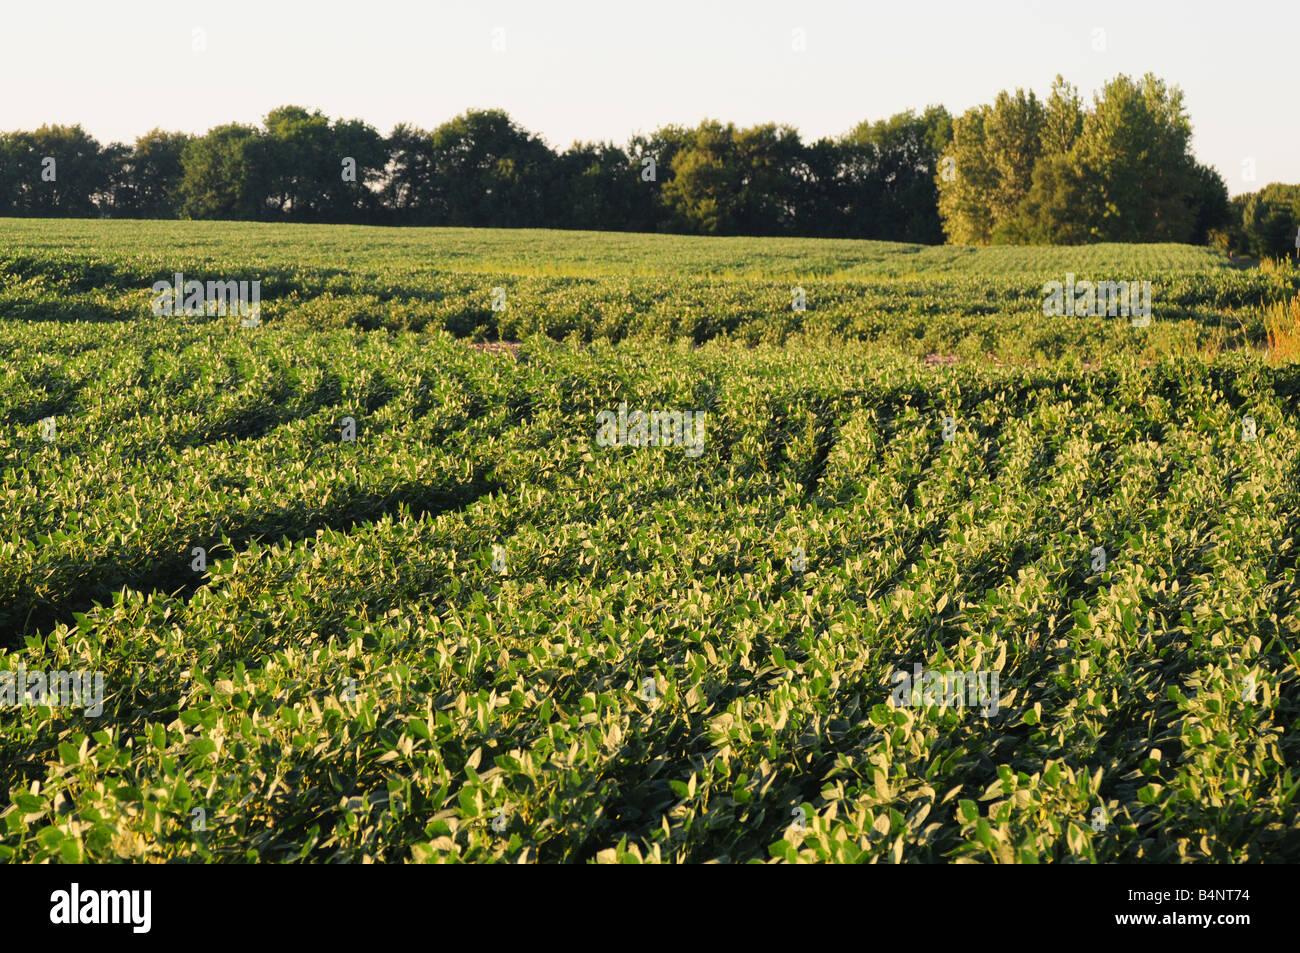 Illinois soybean or soy bean farm field - Stock Image